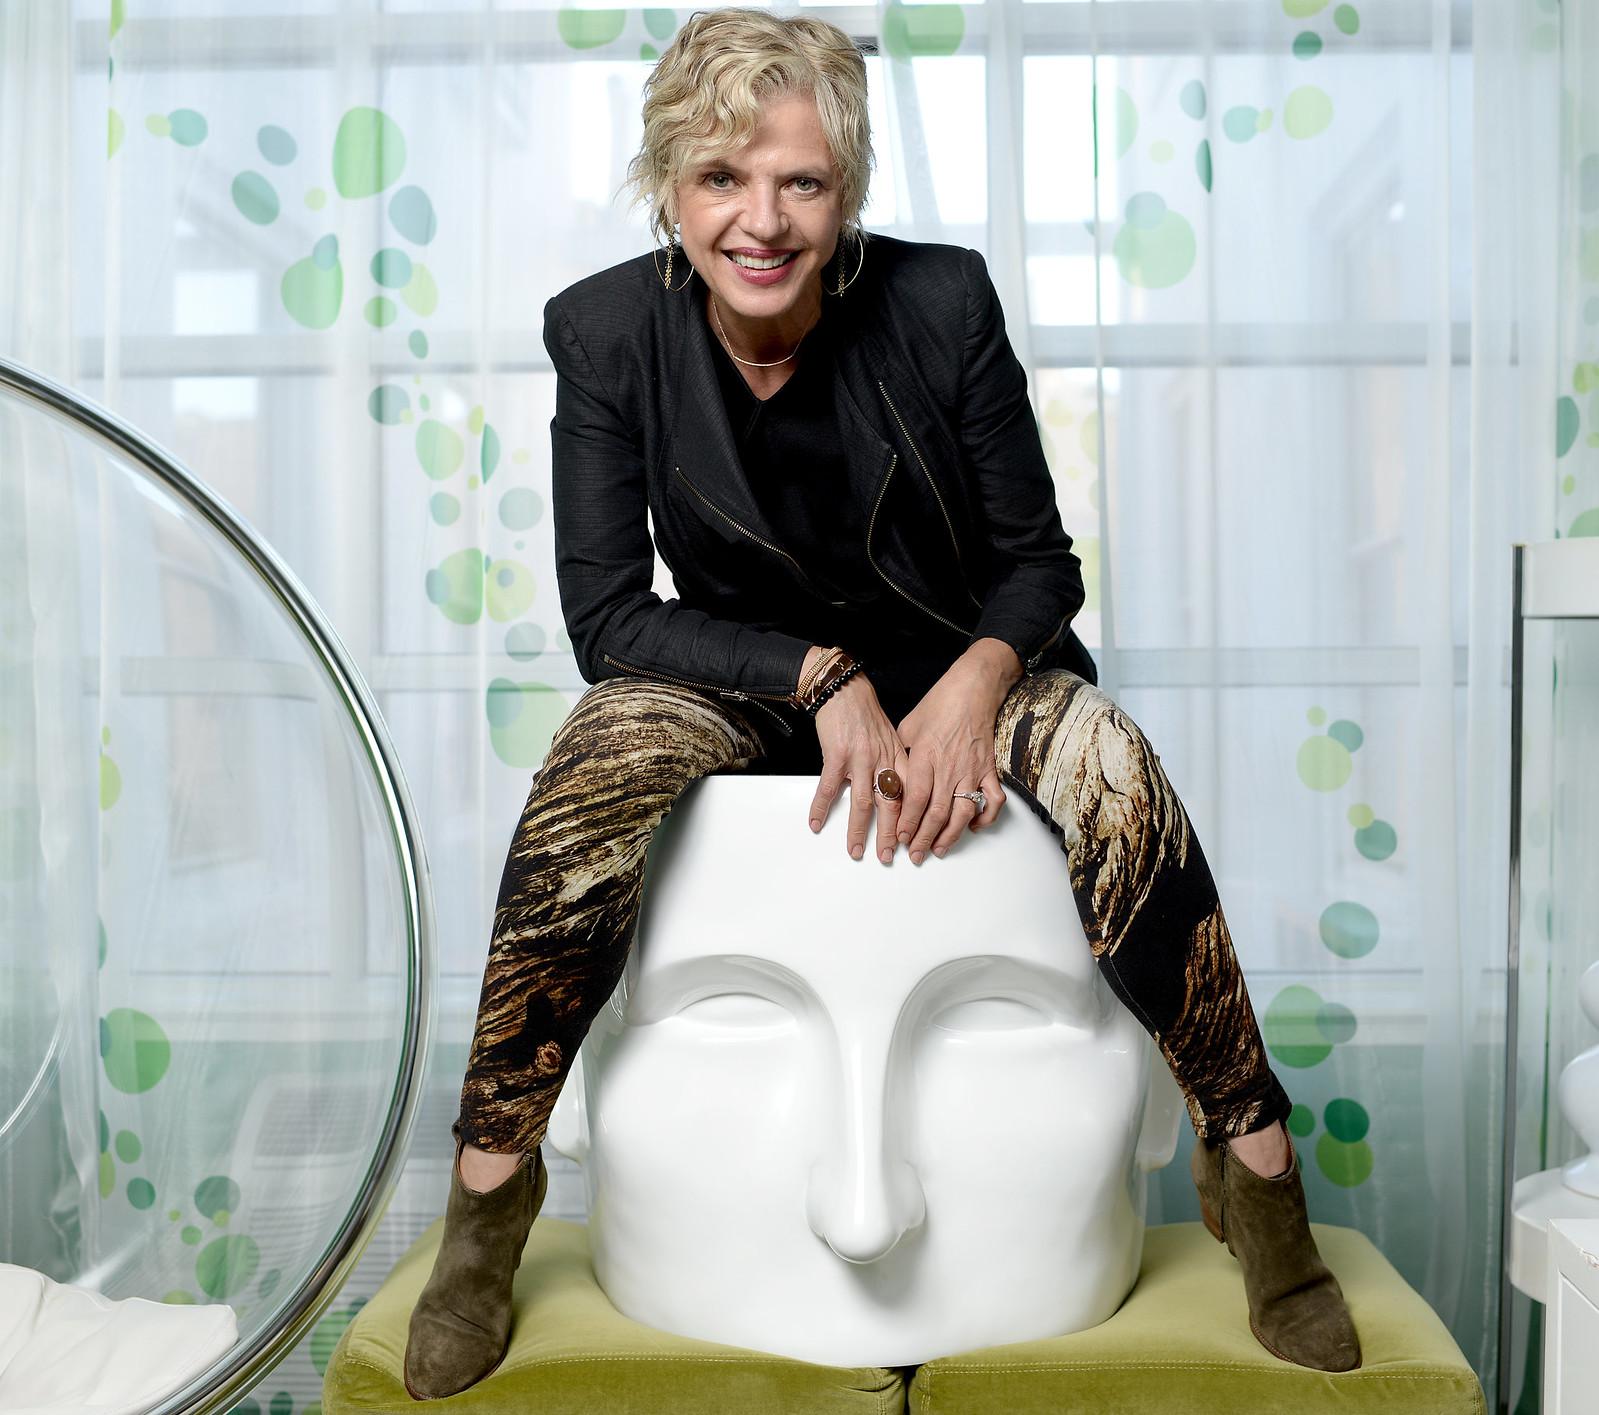 Yvonne Lembi-Detert